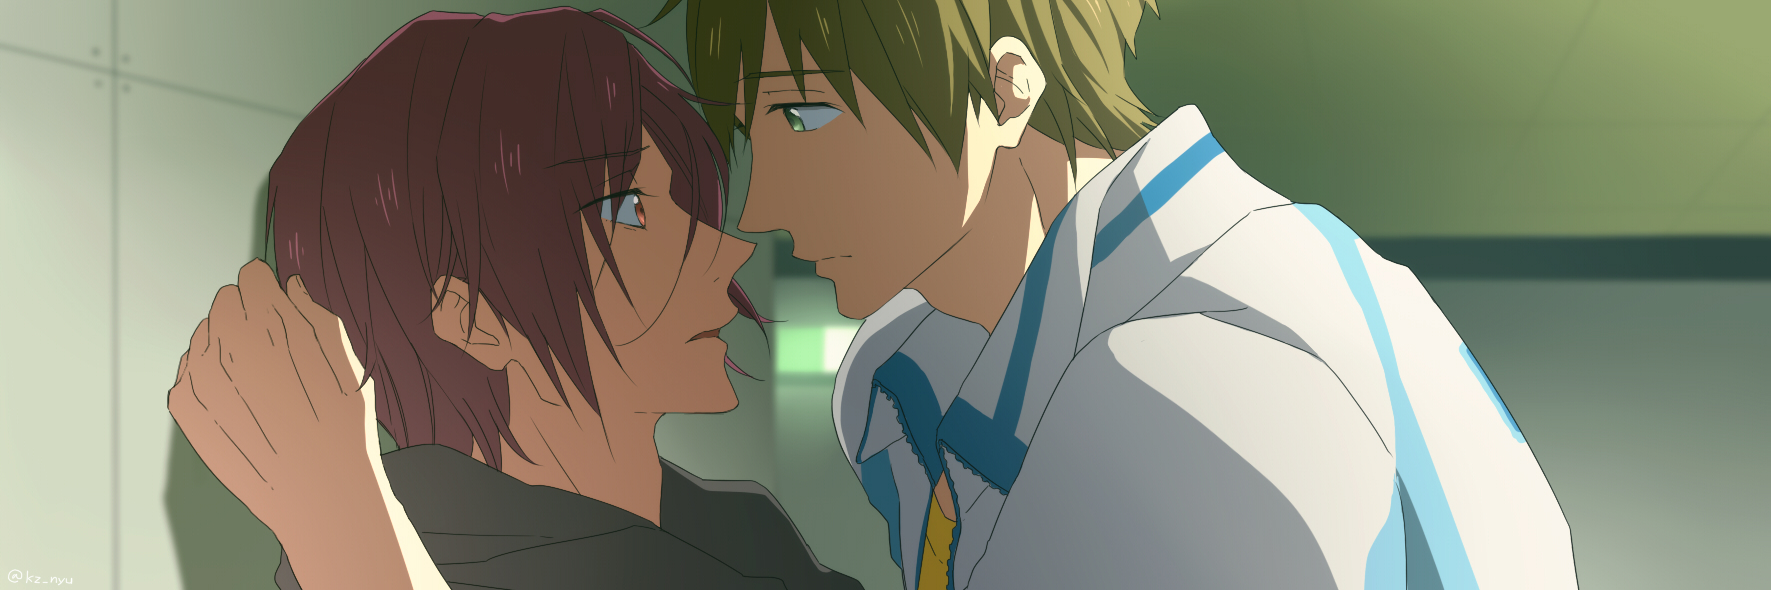 Free Image 1771570 Zerochan Anime Image Board ~ rin matsuoka facebook header. free image 1771570 zerochan anime